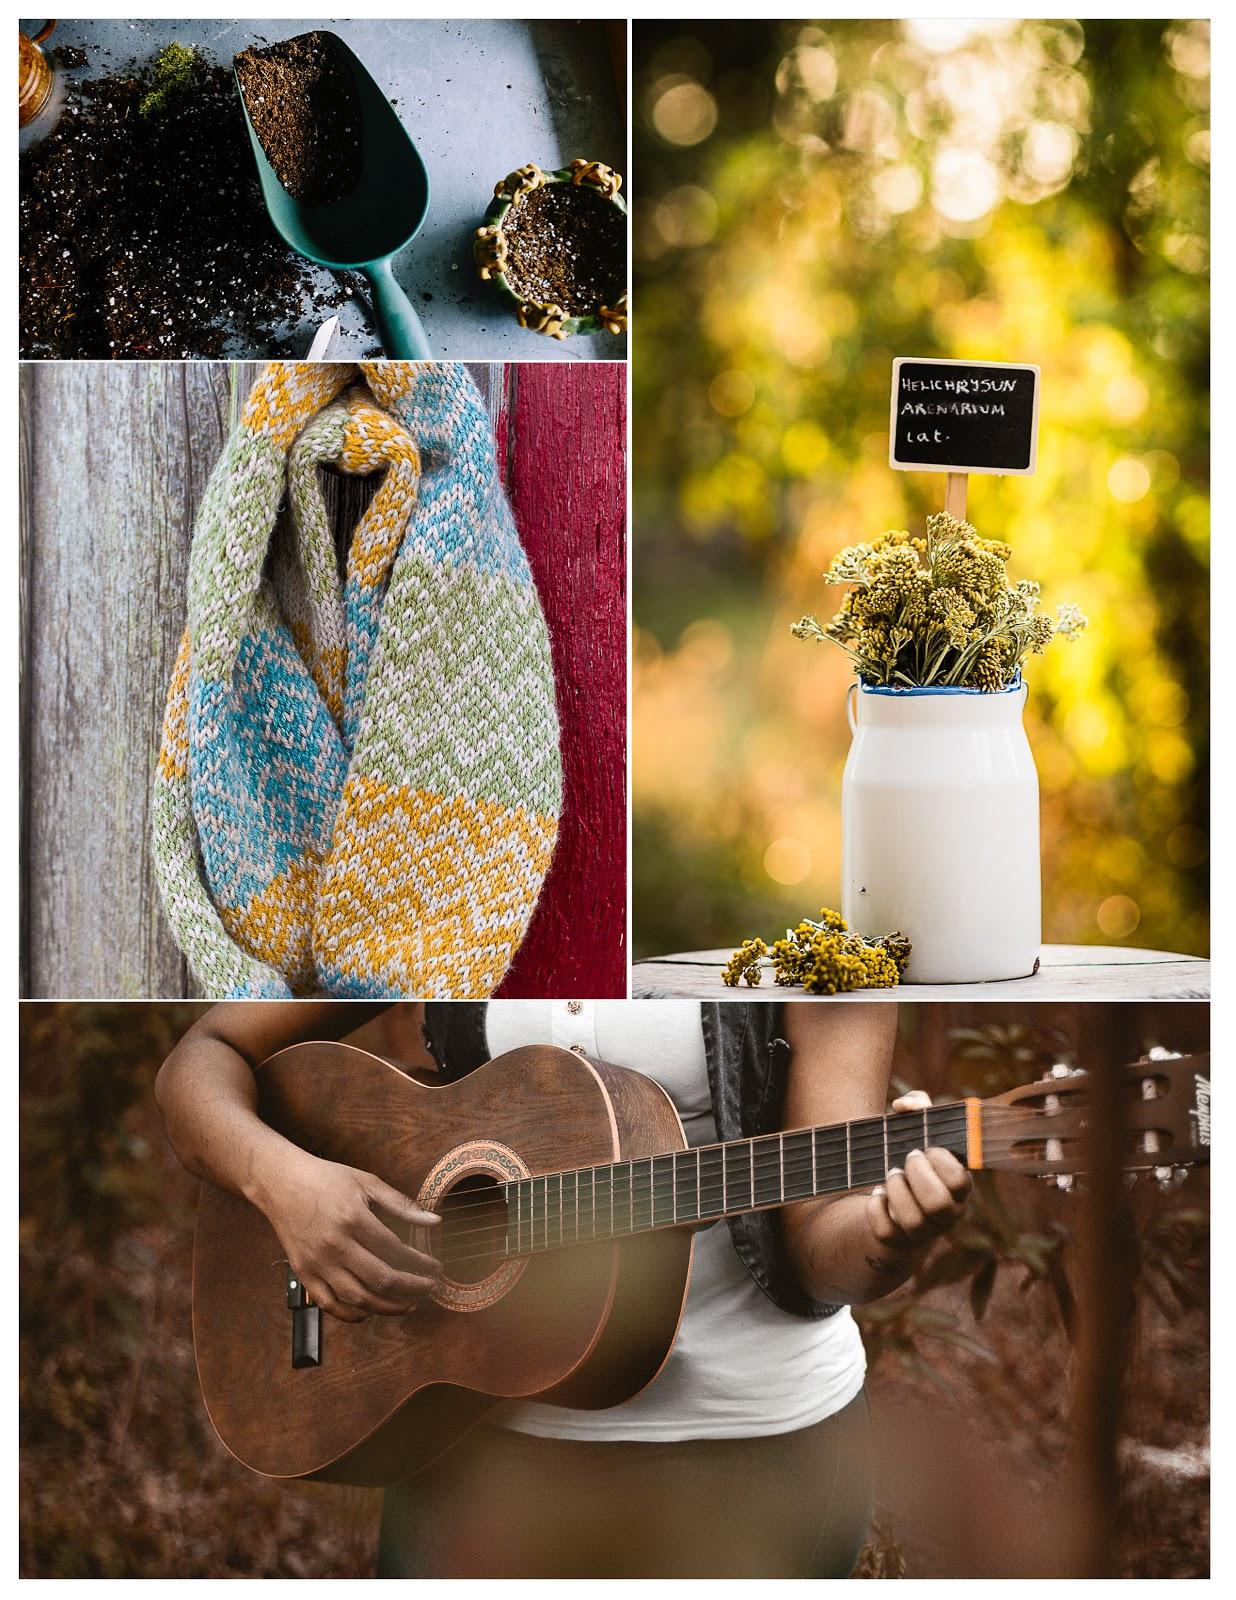 Free loom knitting pattern, loom knit, infinity scarf, fair Isle, infinity cowl, loom knitting pattern, fair isle scarf, loom knit fair isle scarf, tube scarf